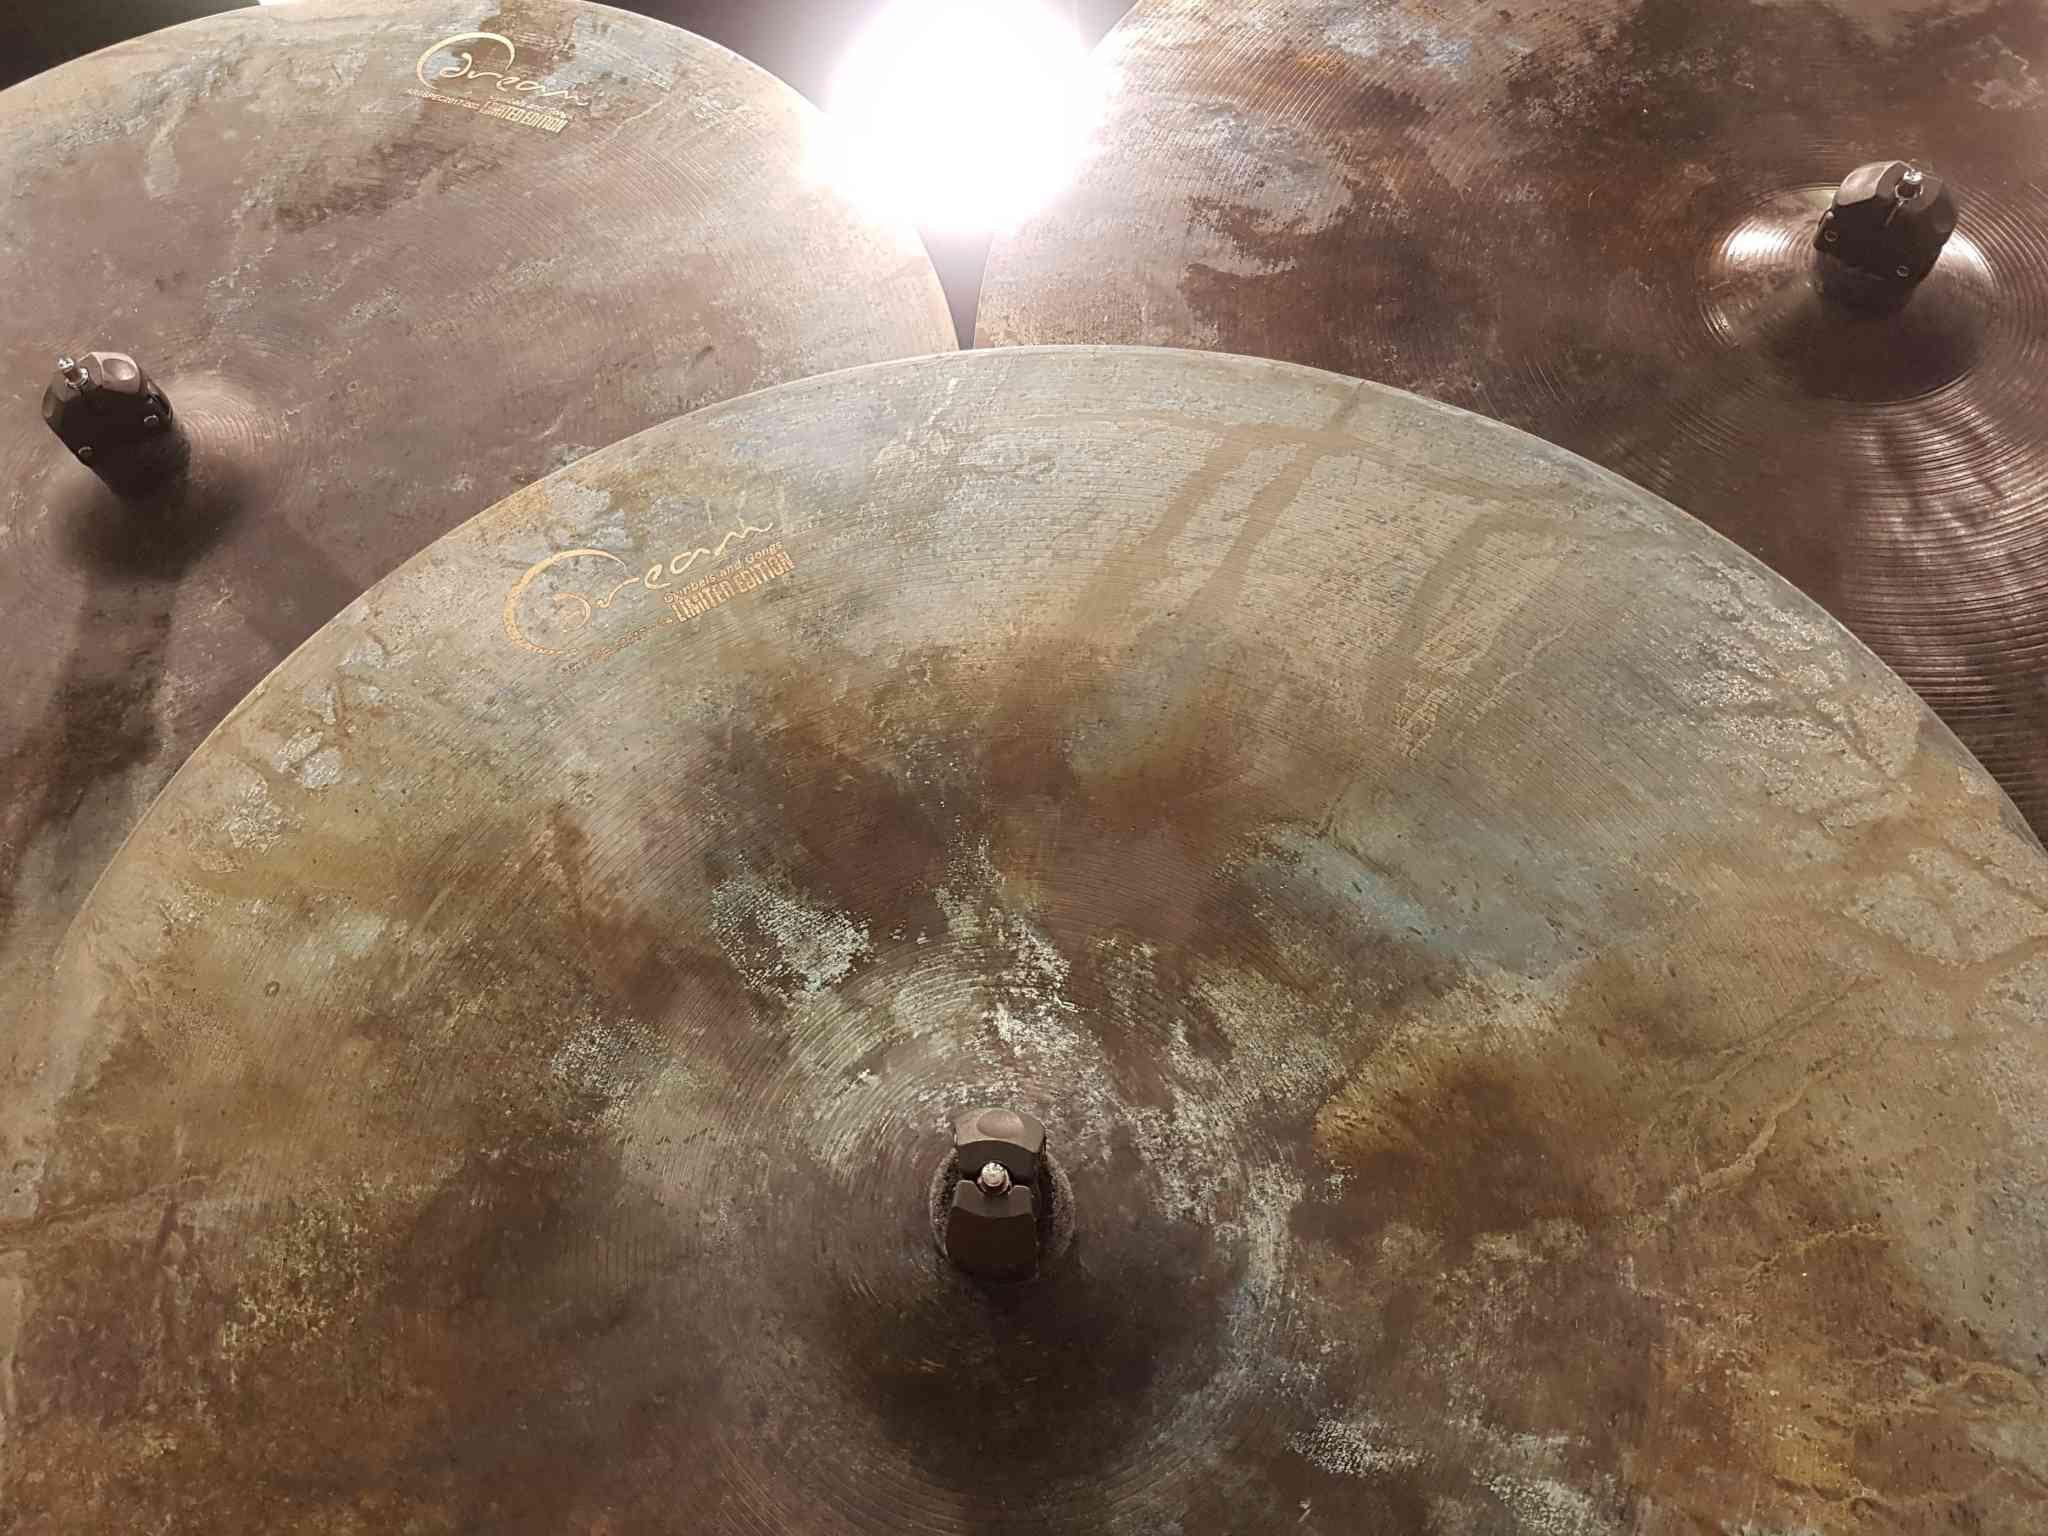 Dream Cymbals – Ny agentur hos Fitzpatrick i Skandinavien